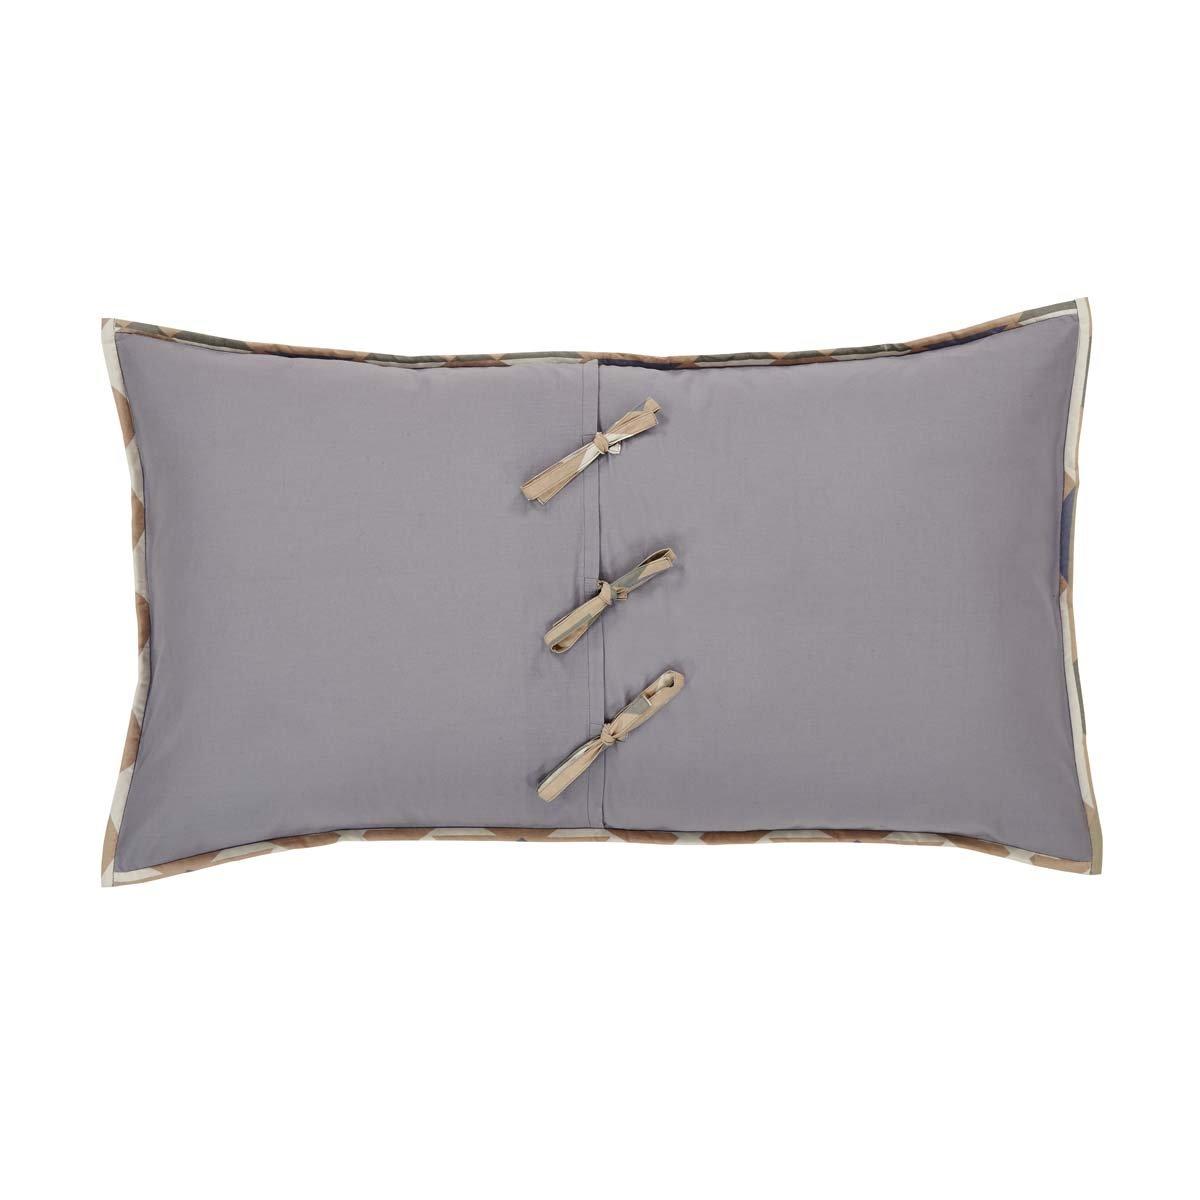 Grey El Dorado Pink Sham King 29759 VHC Brands Boho /& Eclectic Rustic /& Lodge Bedding